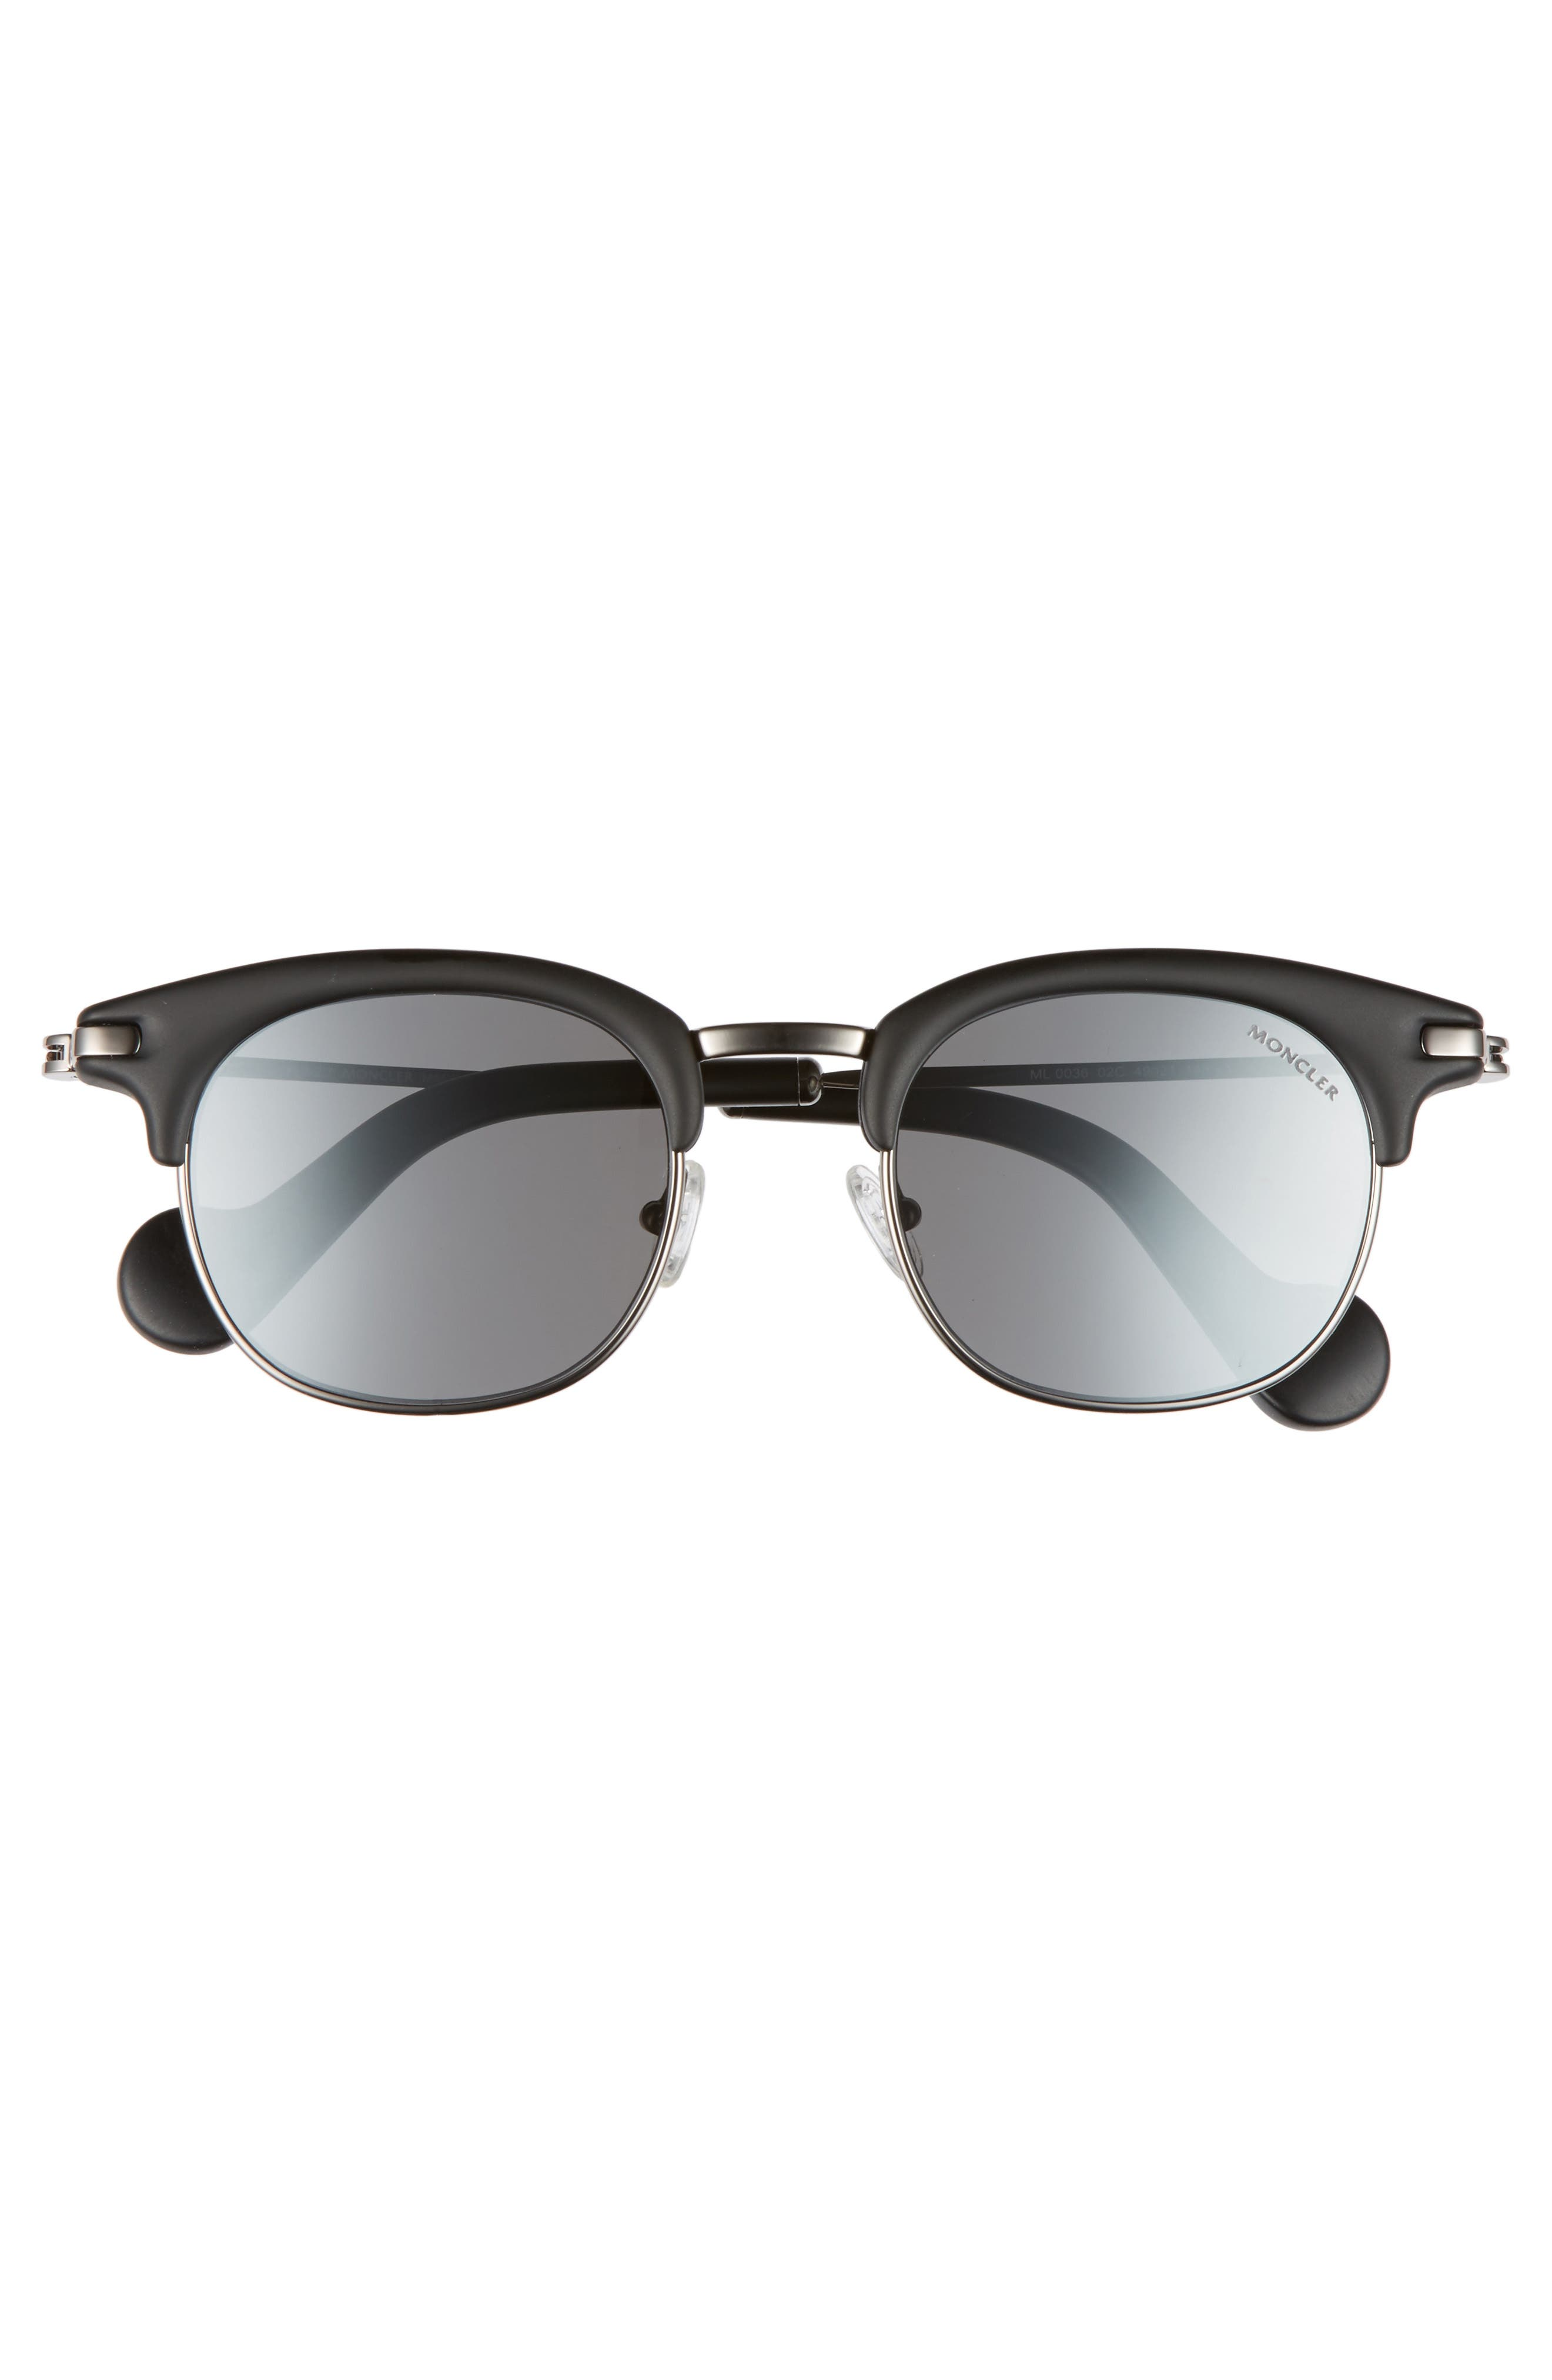 109c9a26fc Men s Moncler Sunglasses   Eye Glasses